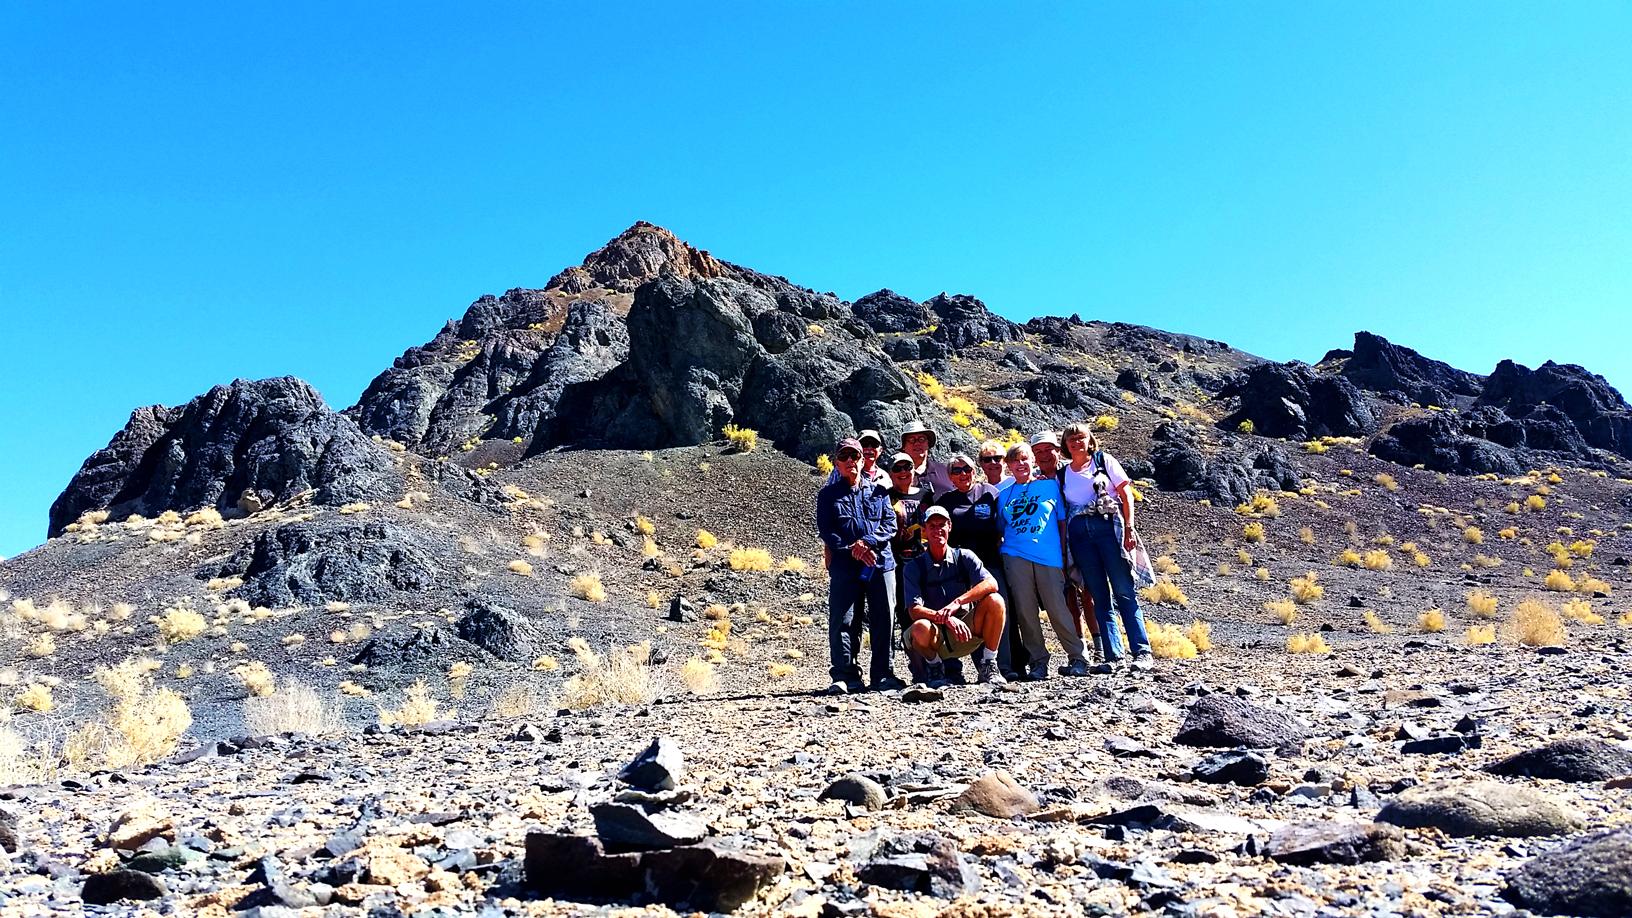 The group in the Black Rock Desert